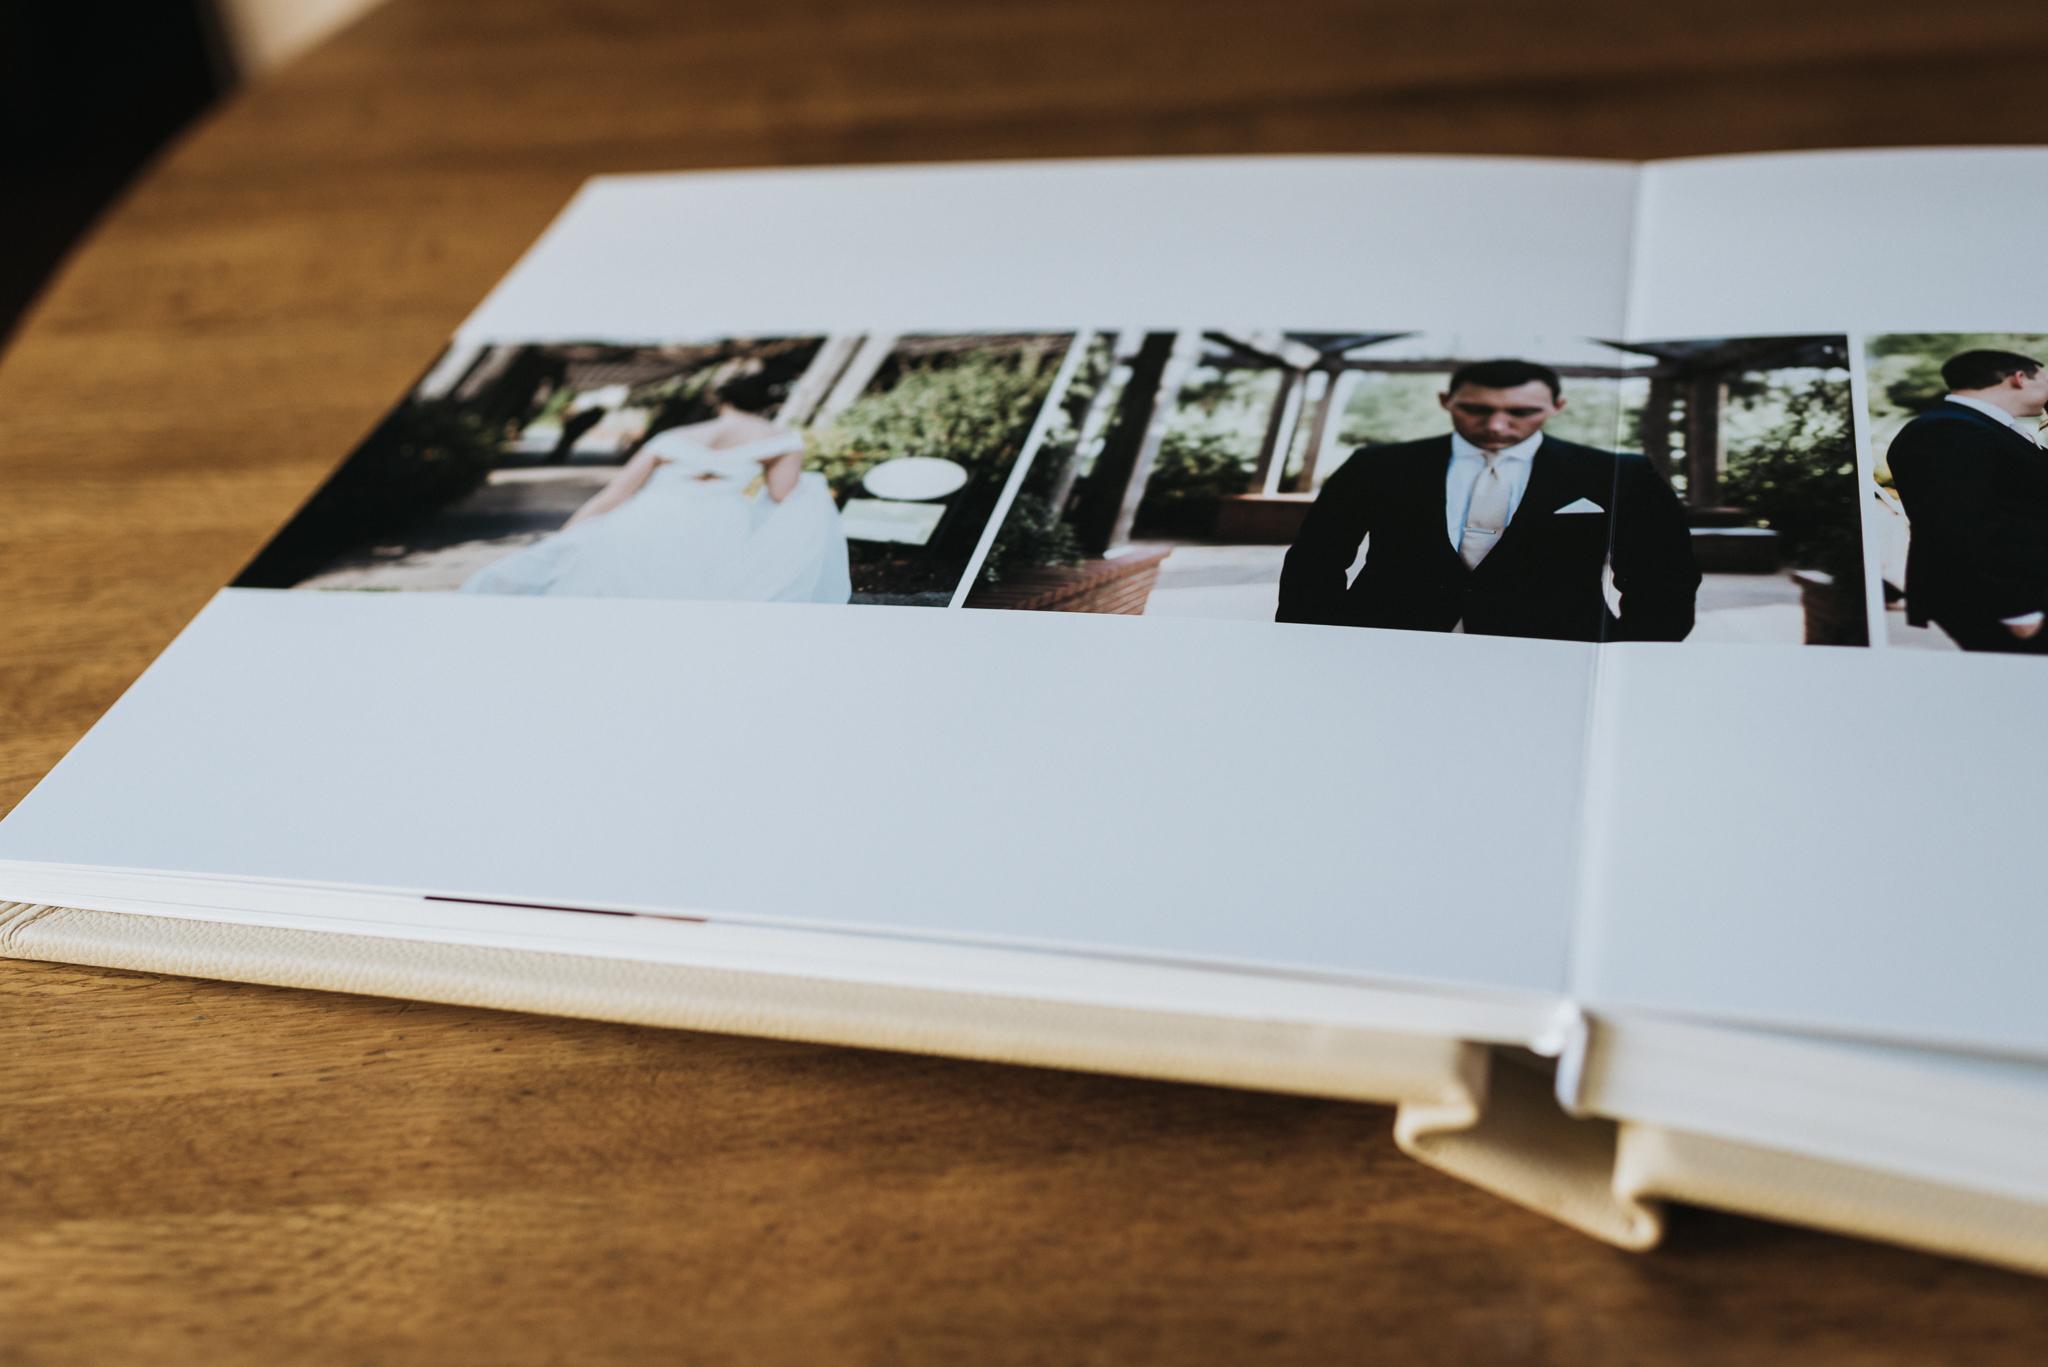 Open wedding album